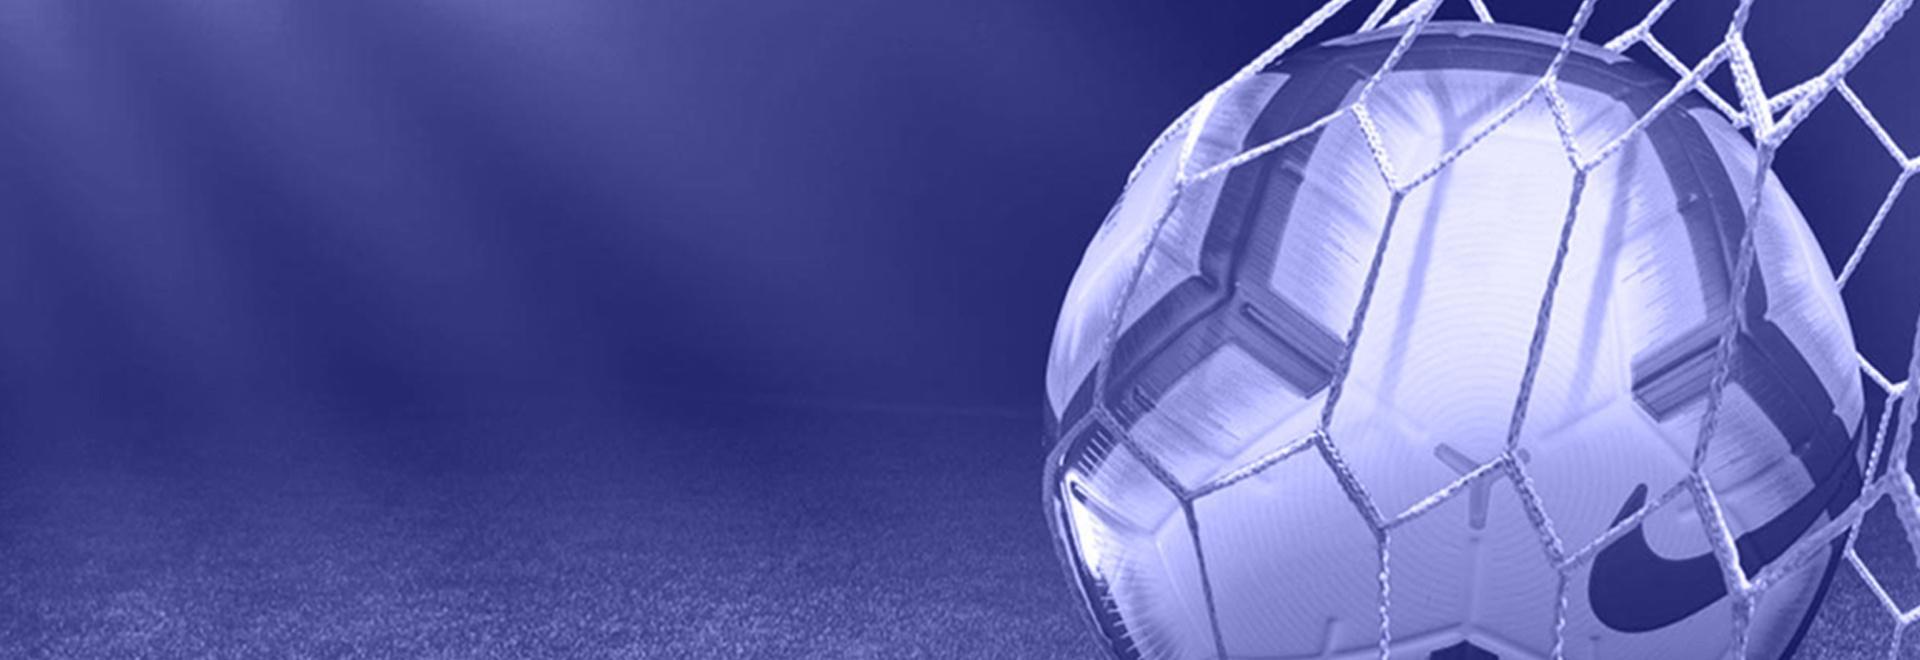 Inter - Sampdoria 09/01/05